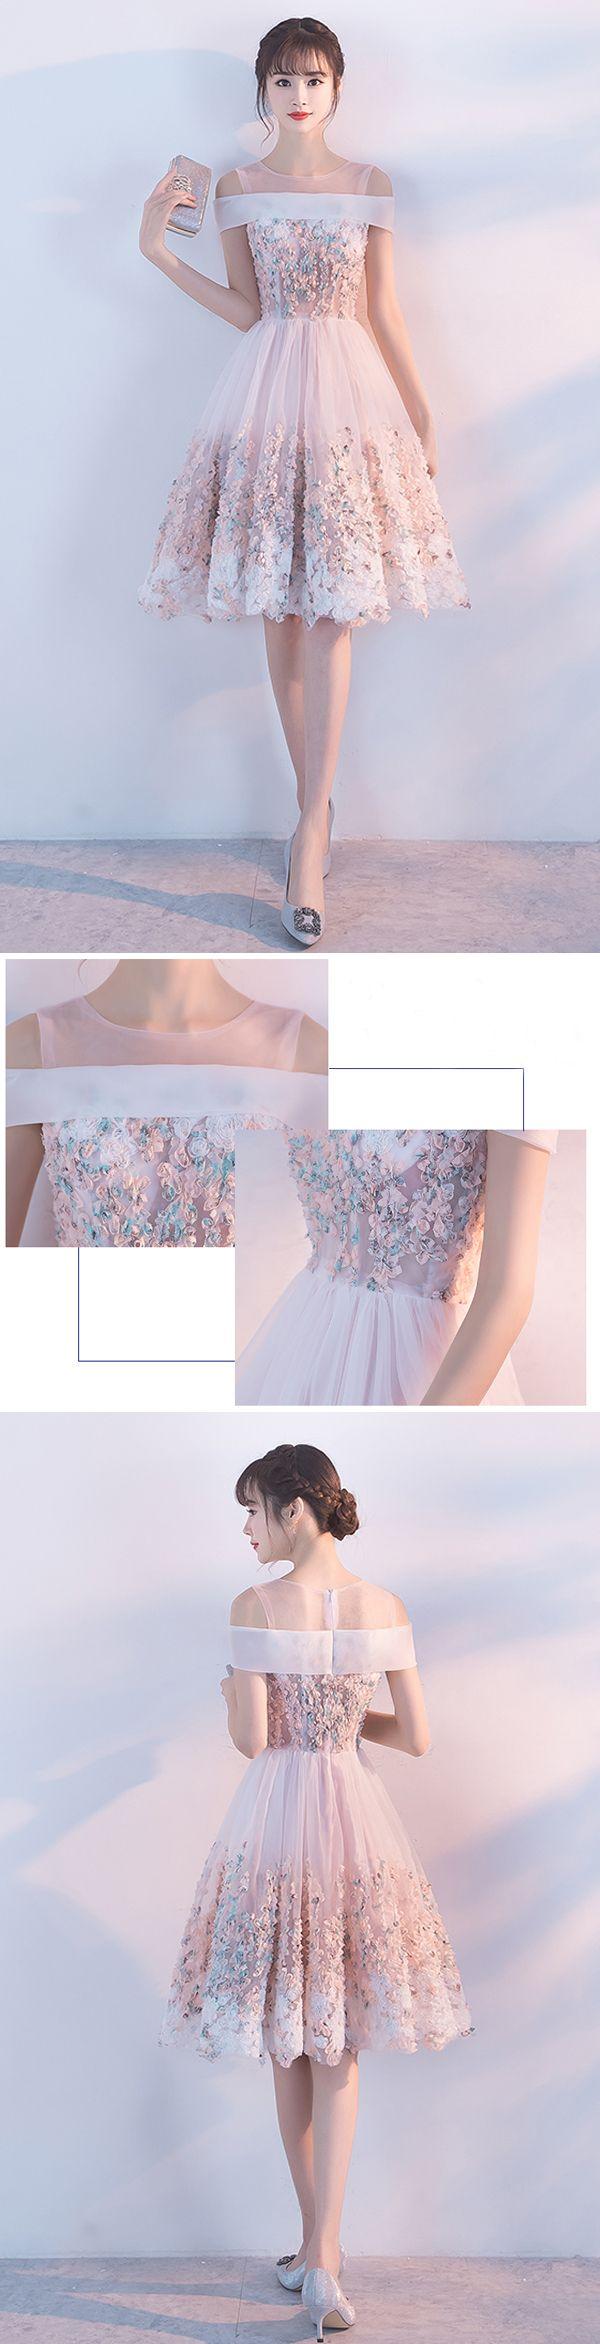 Short Homecoming Dress, Tulle Homecoming Dress, Knee-Length Homecoming Dress, Applique Junior School Dress, Beautiful Homecoming Dress, 17372